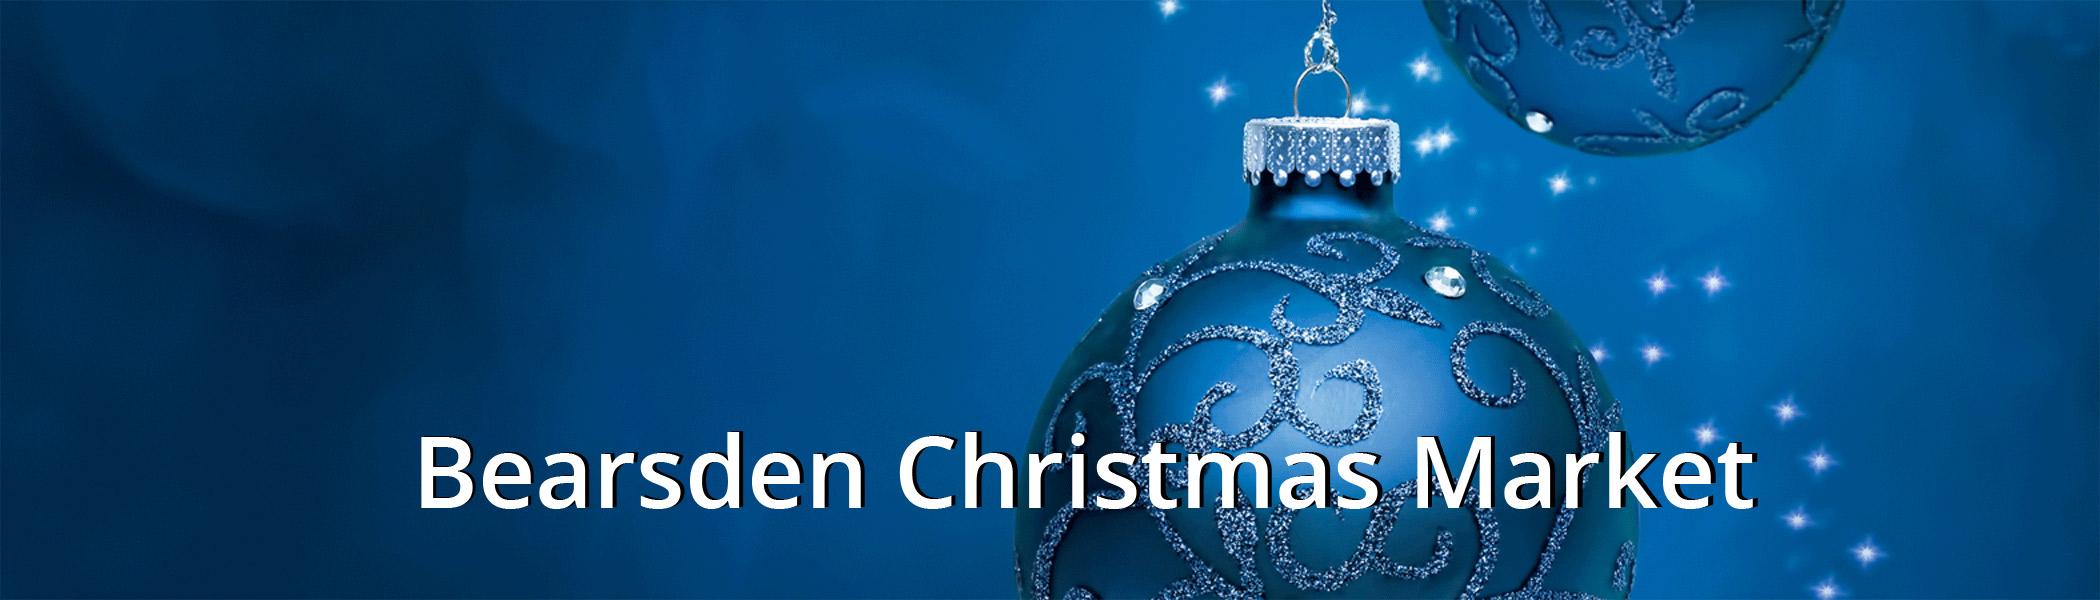 Bearsden Christmas Market 2020 news